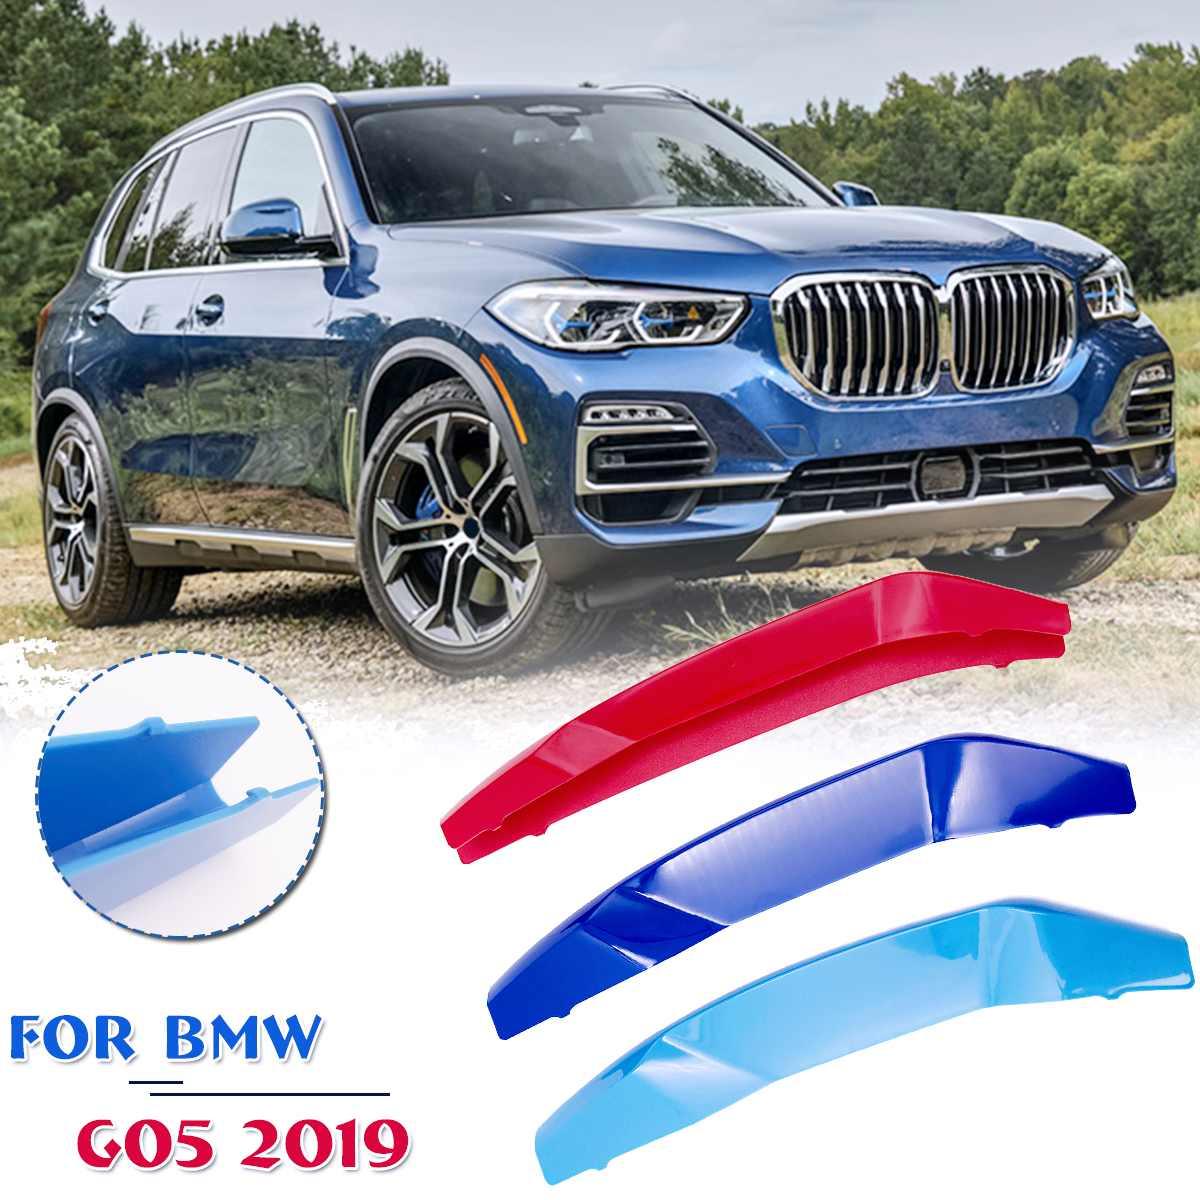 Autoleader 3 Colors For BMW X5 G05 2019 M-Tech Sport Kidney Grille 3 Tricolor Grille Cover Clips Trim